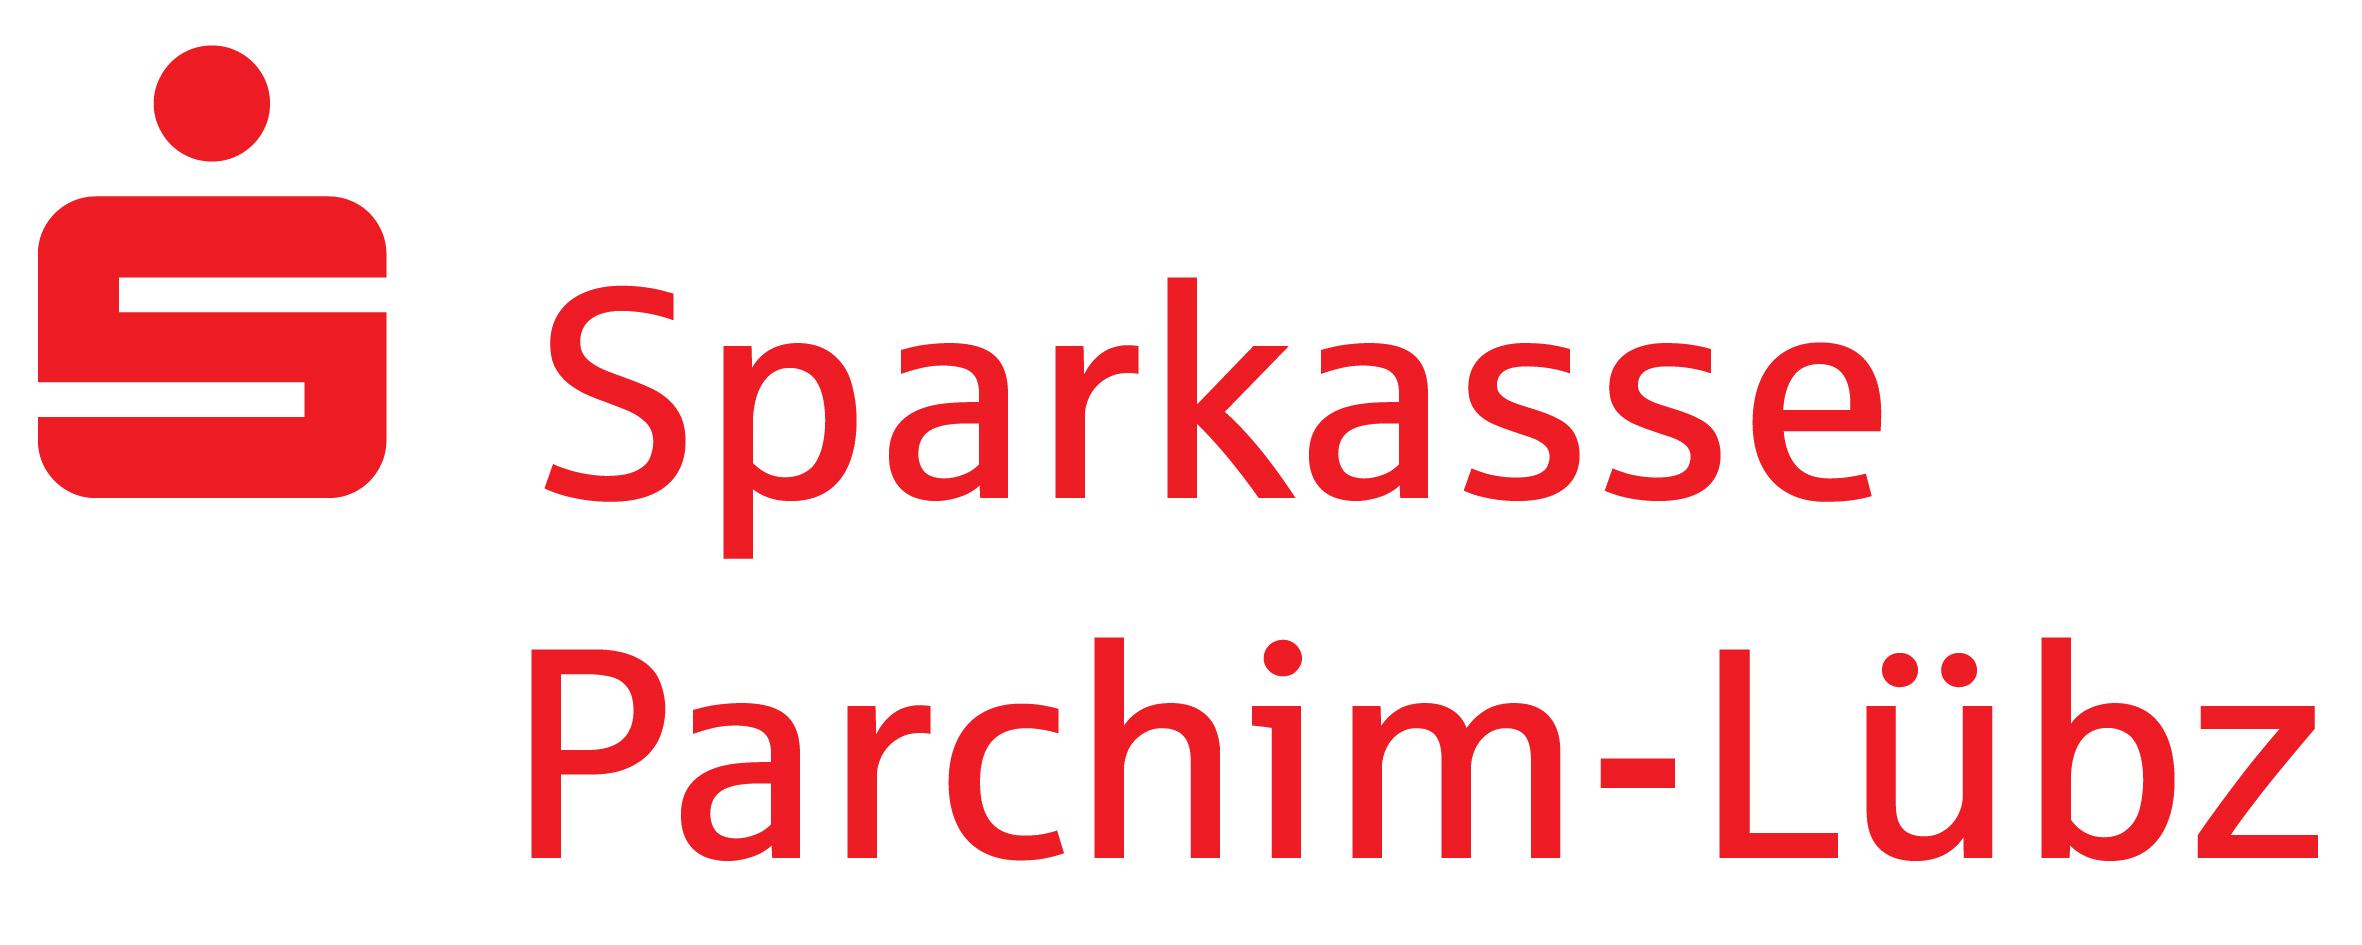 Sparkasse Parchim-Lübz